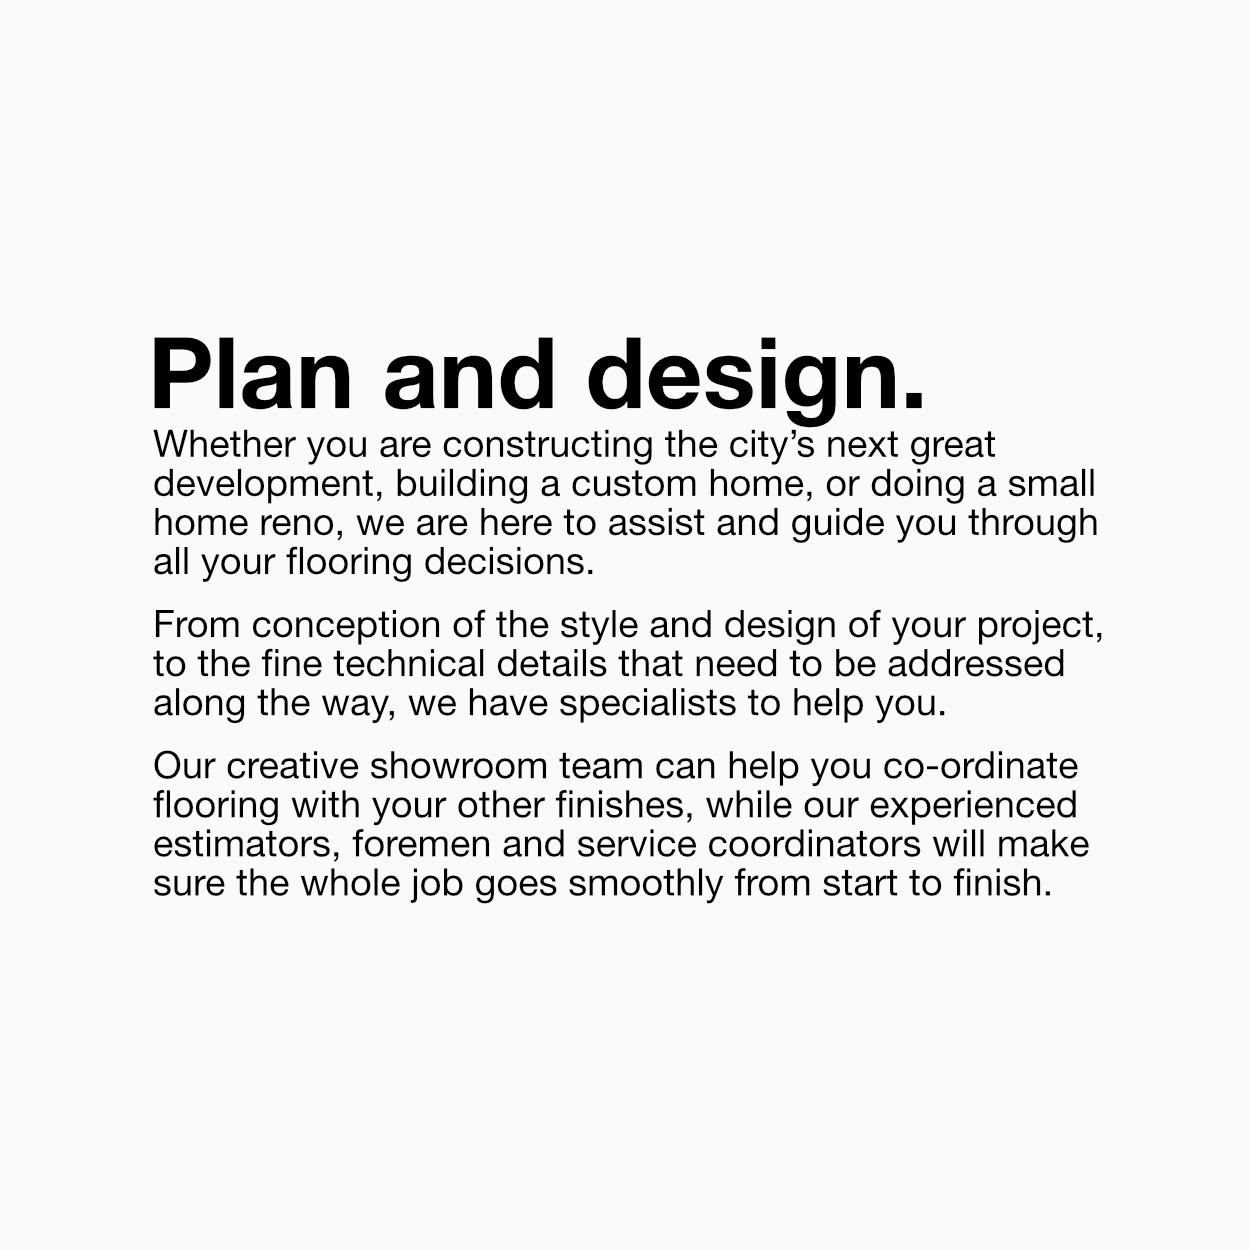 plan and design.jpg